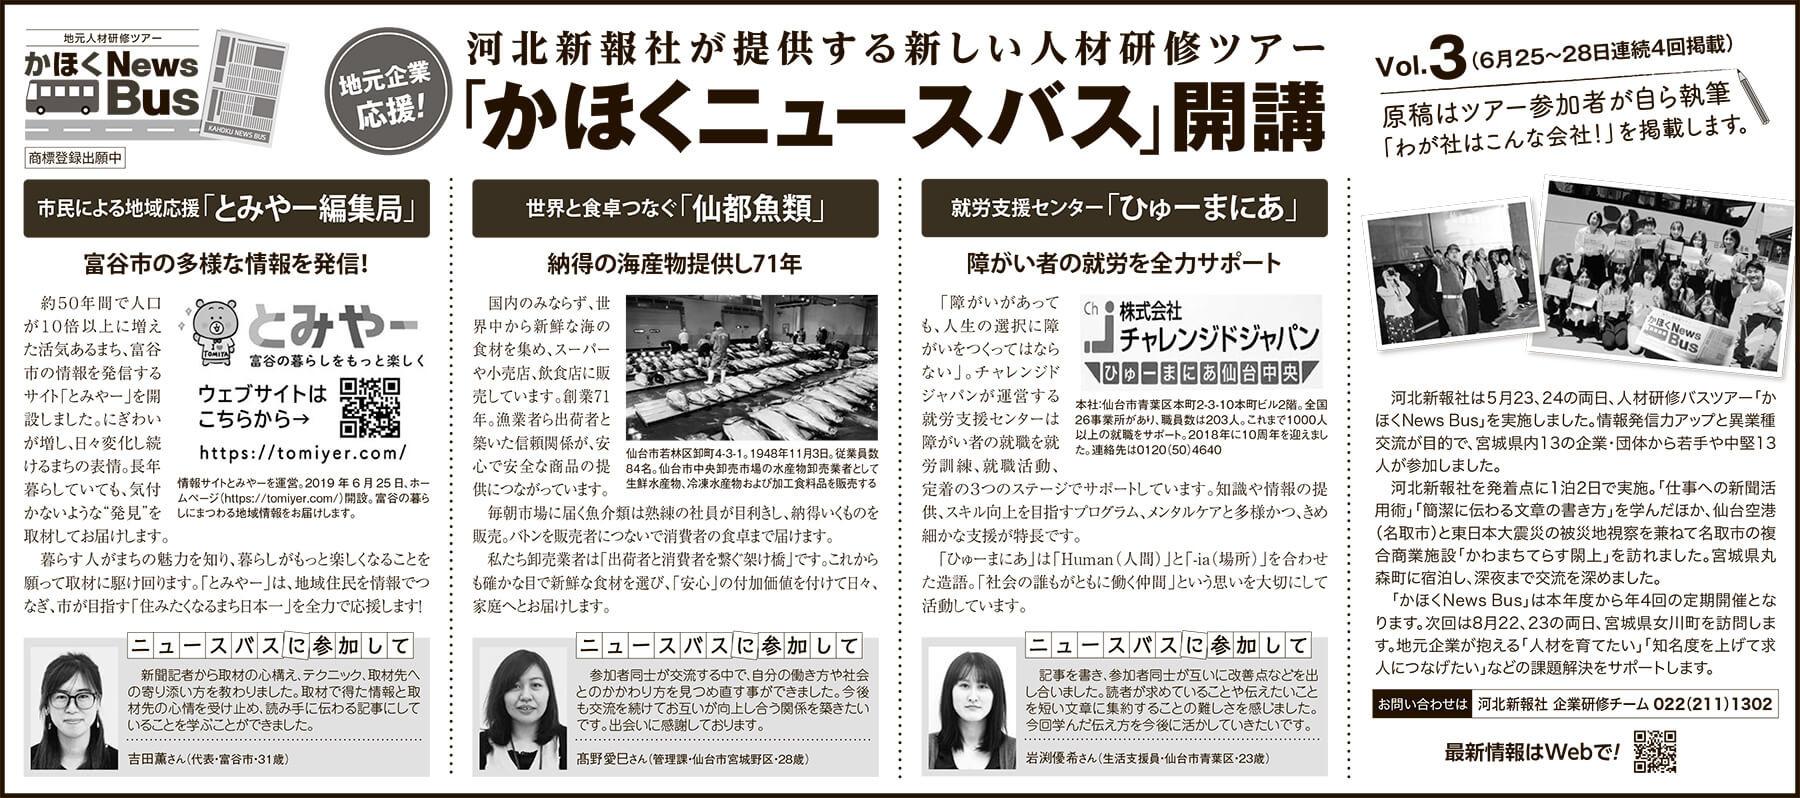 2019News_Bus_5d_総合-3.jpg